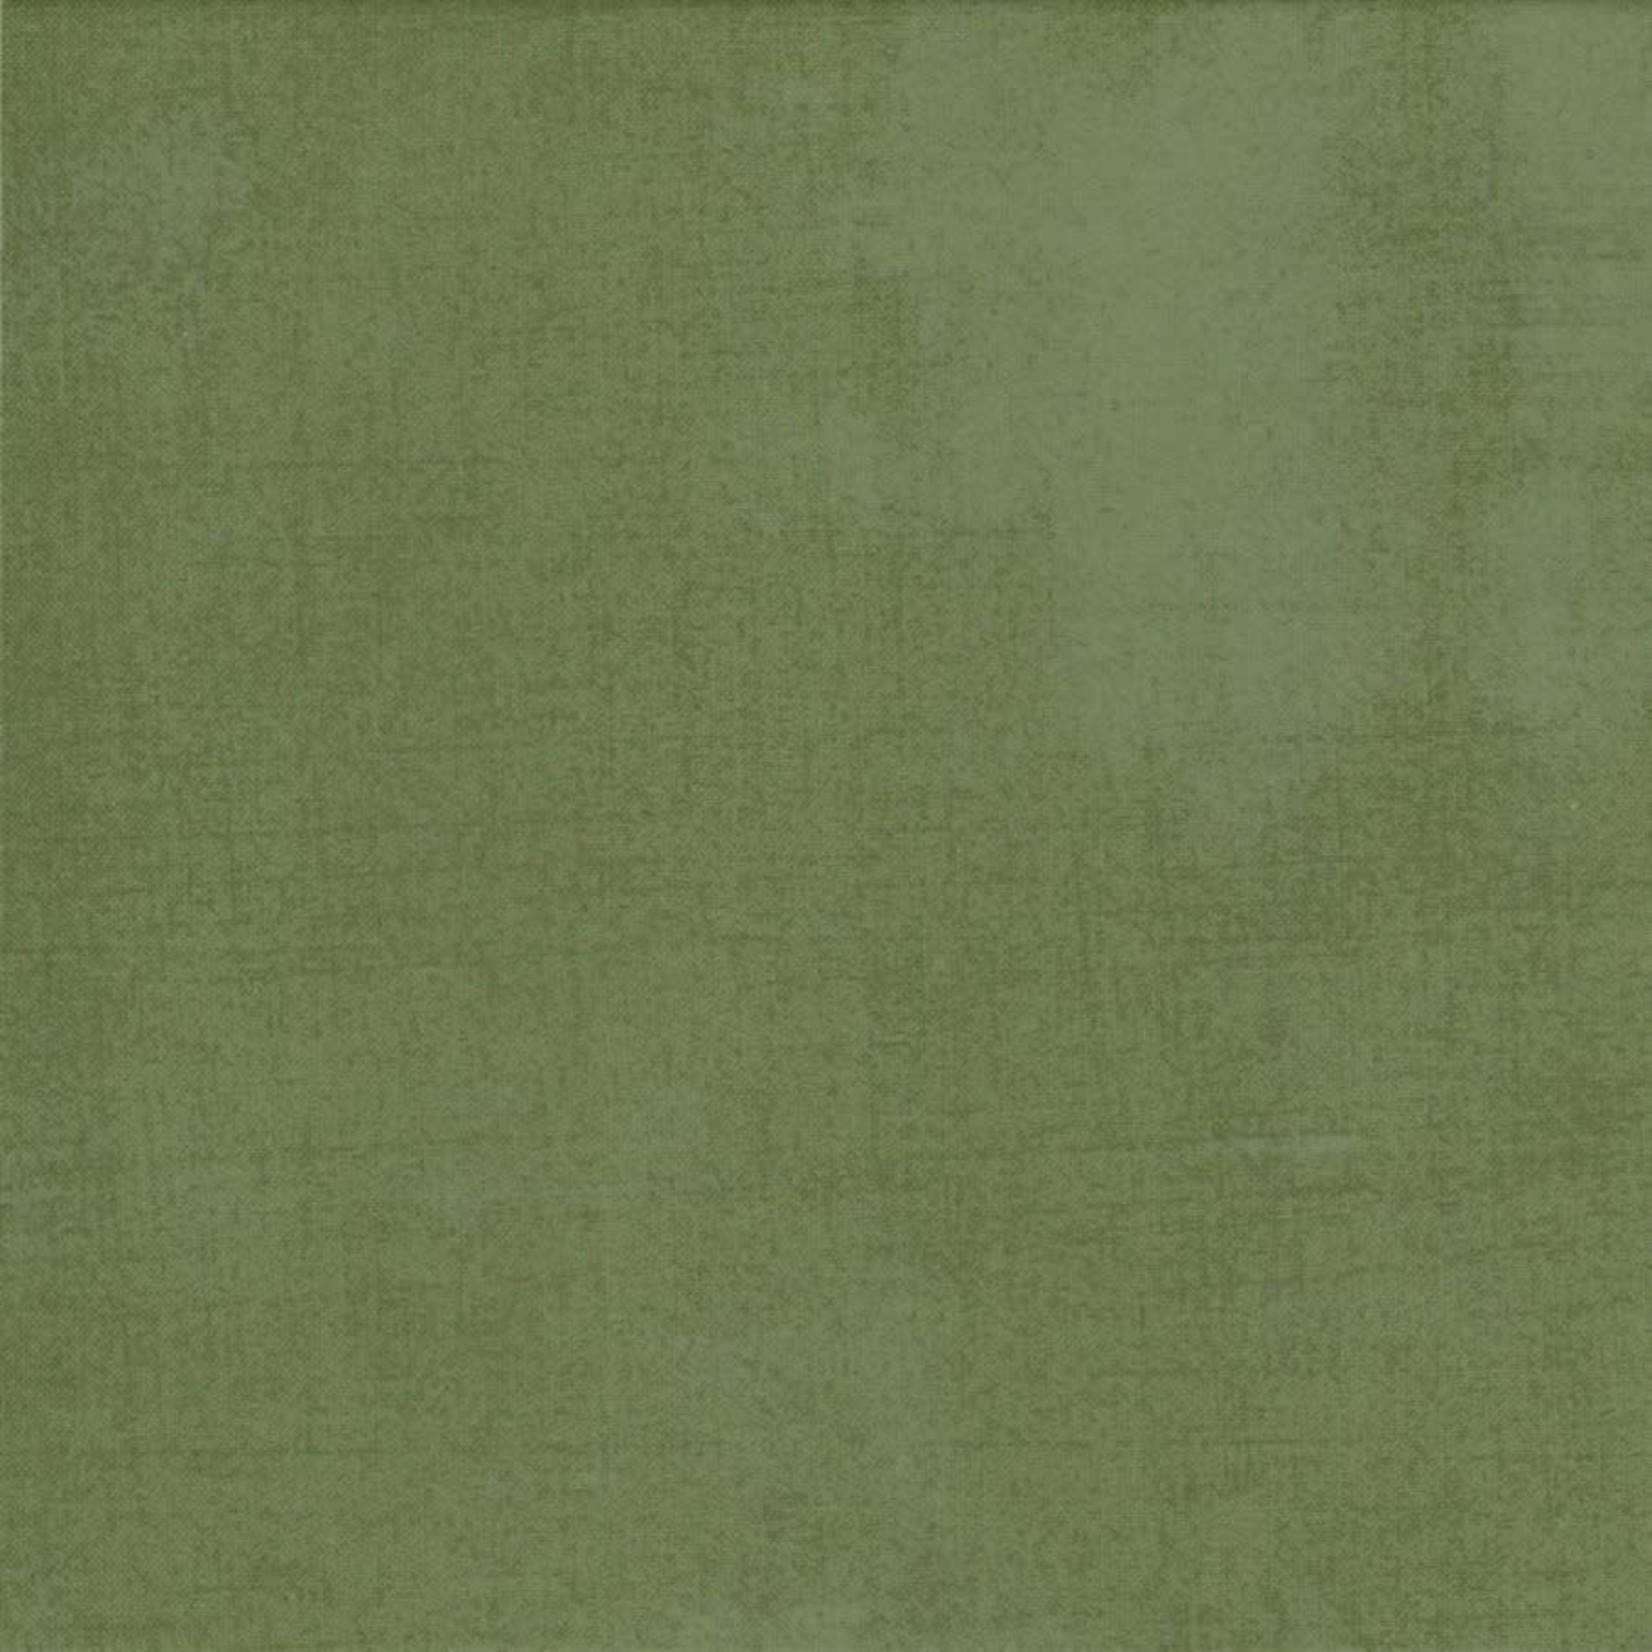 Moda GRUNGE BASICS Grunge - Seafoam per cm or $20/m